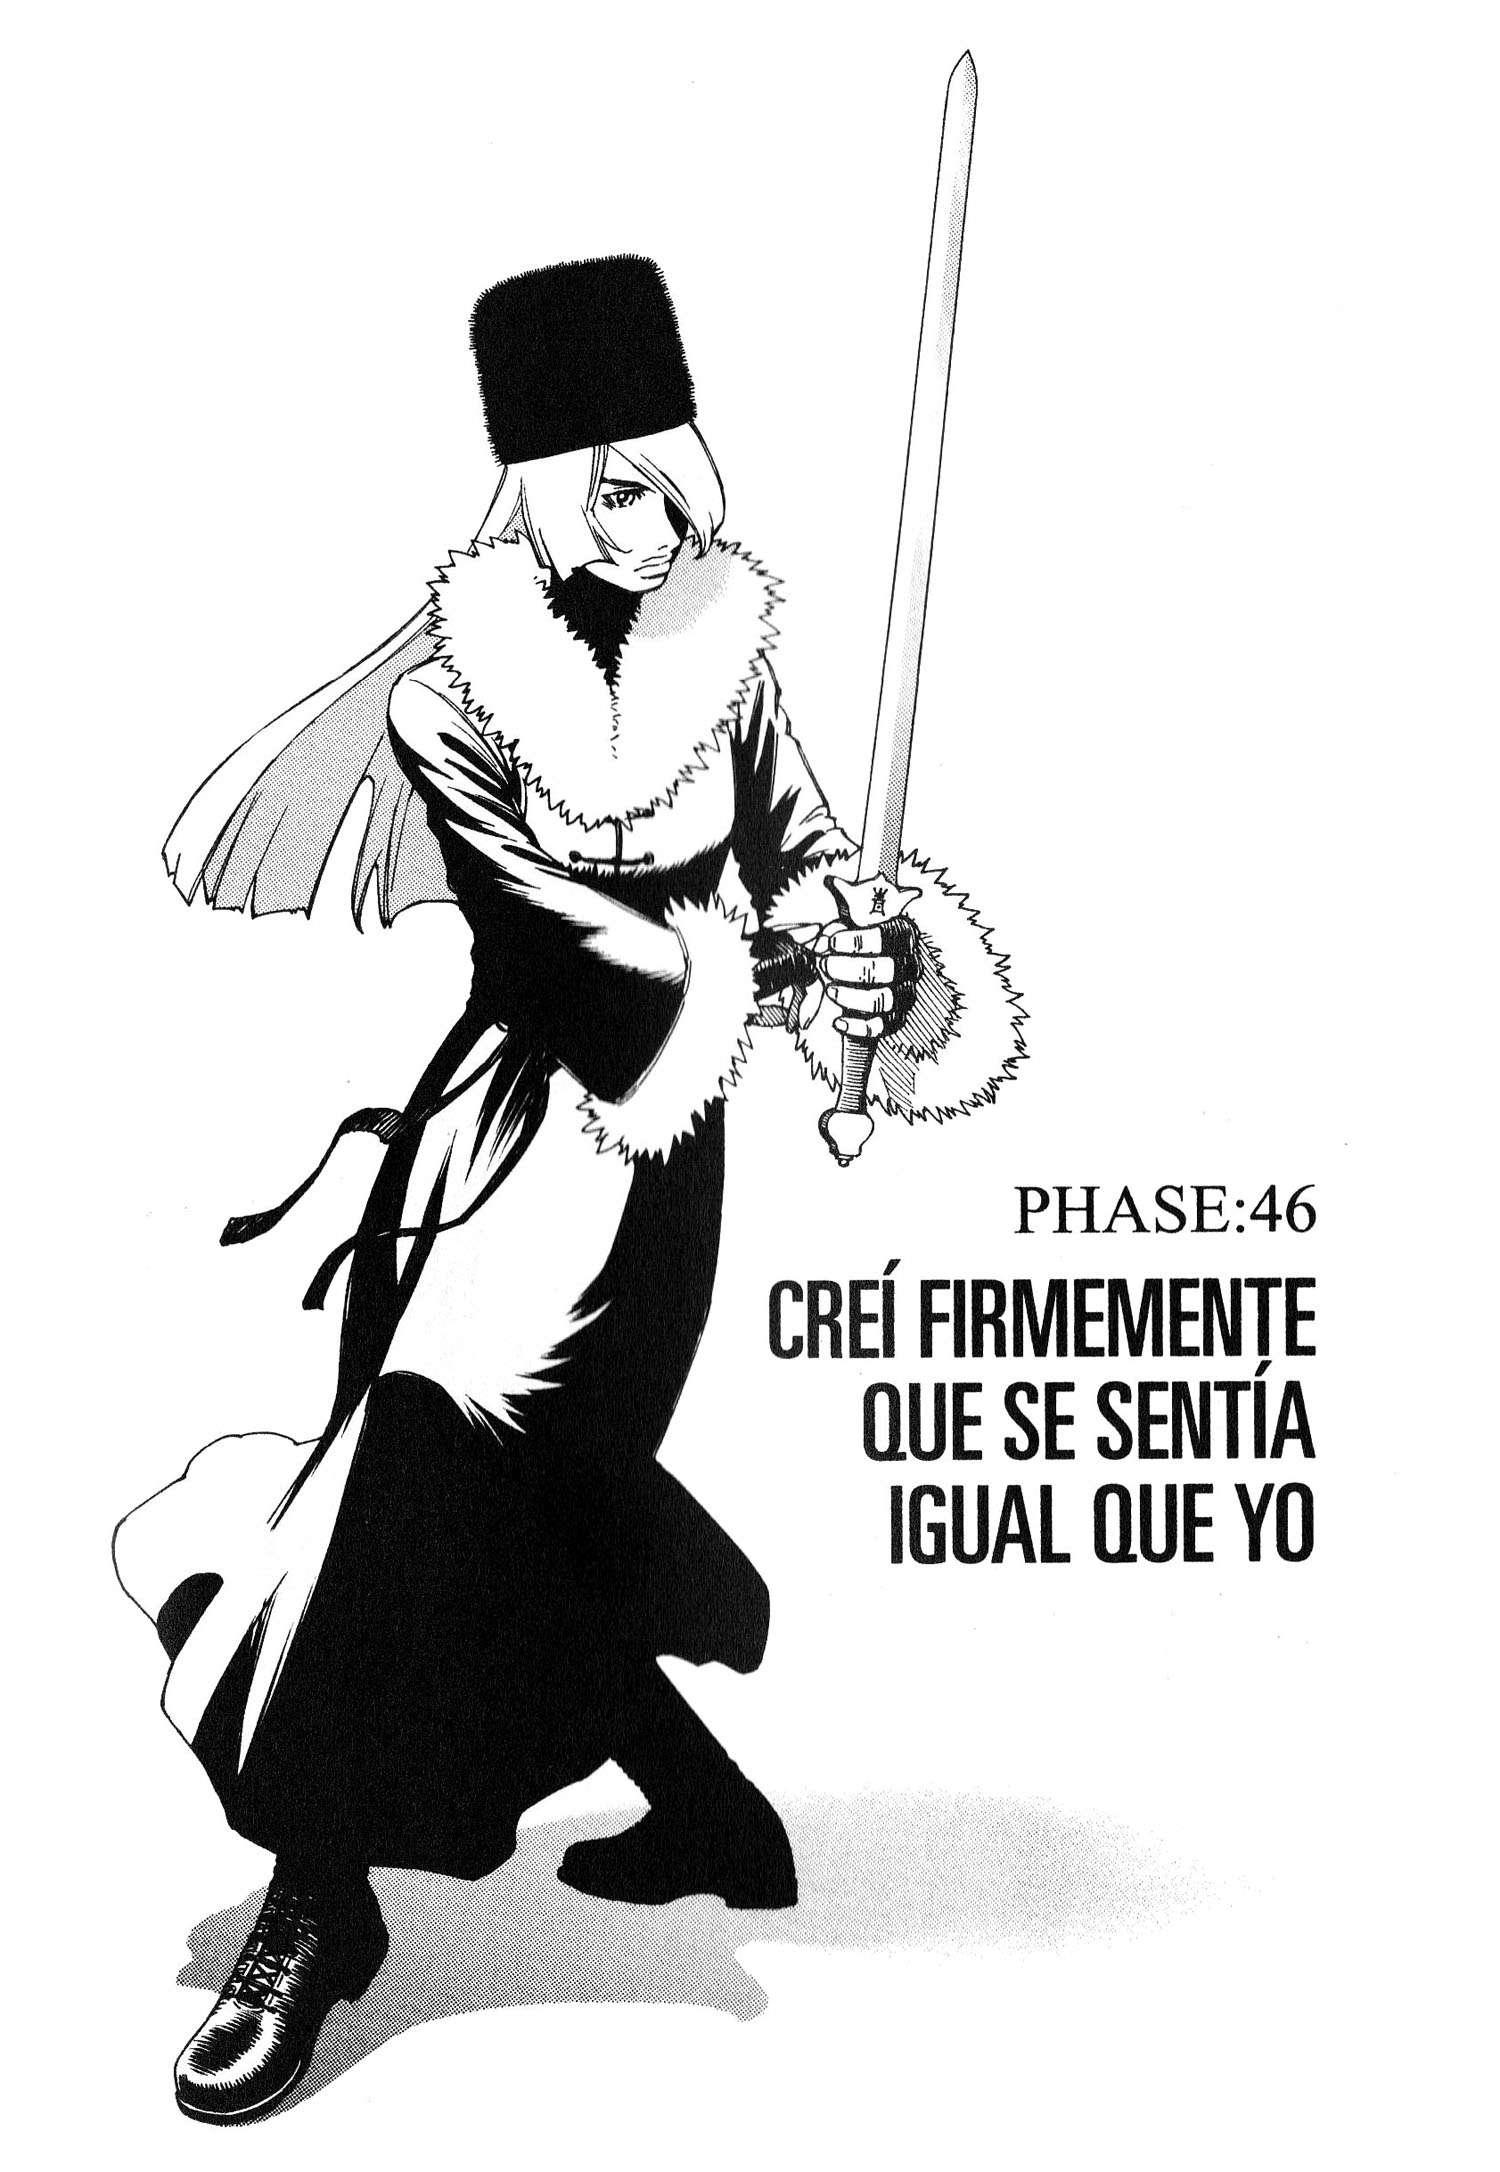 http://c5.ninemanga.com/es_manga/pic2/1/15873/523576/14ddc5c5bbb2f48452a62d6b3830672b.jpg Page 1